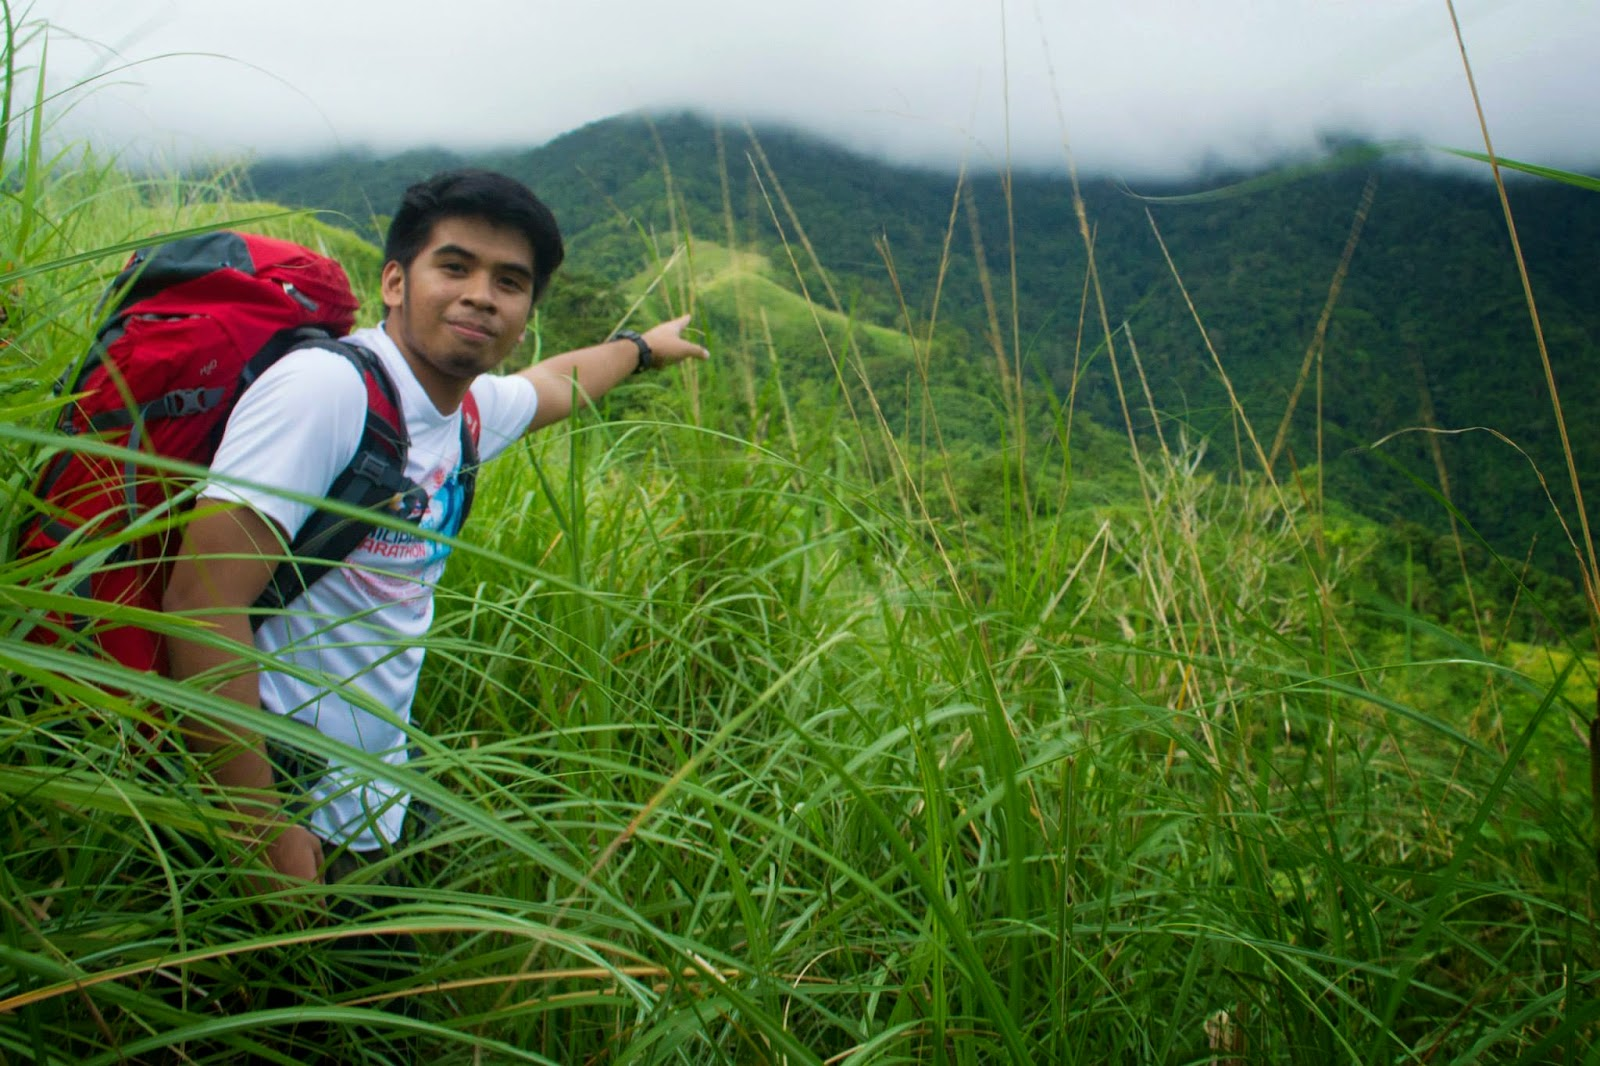 Mt. Banoi - Mt. Tibig